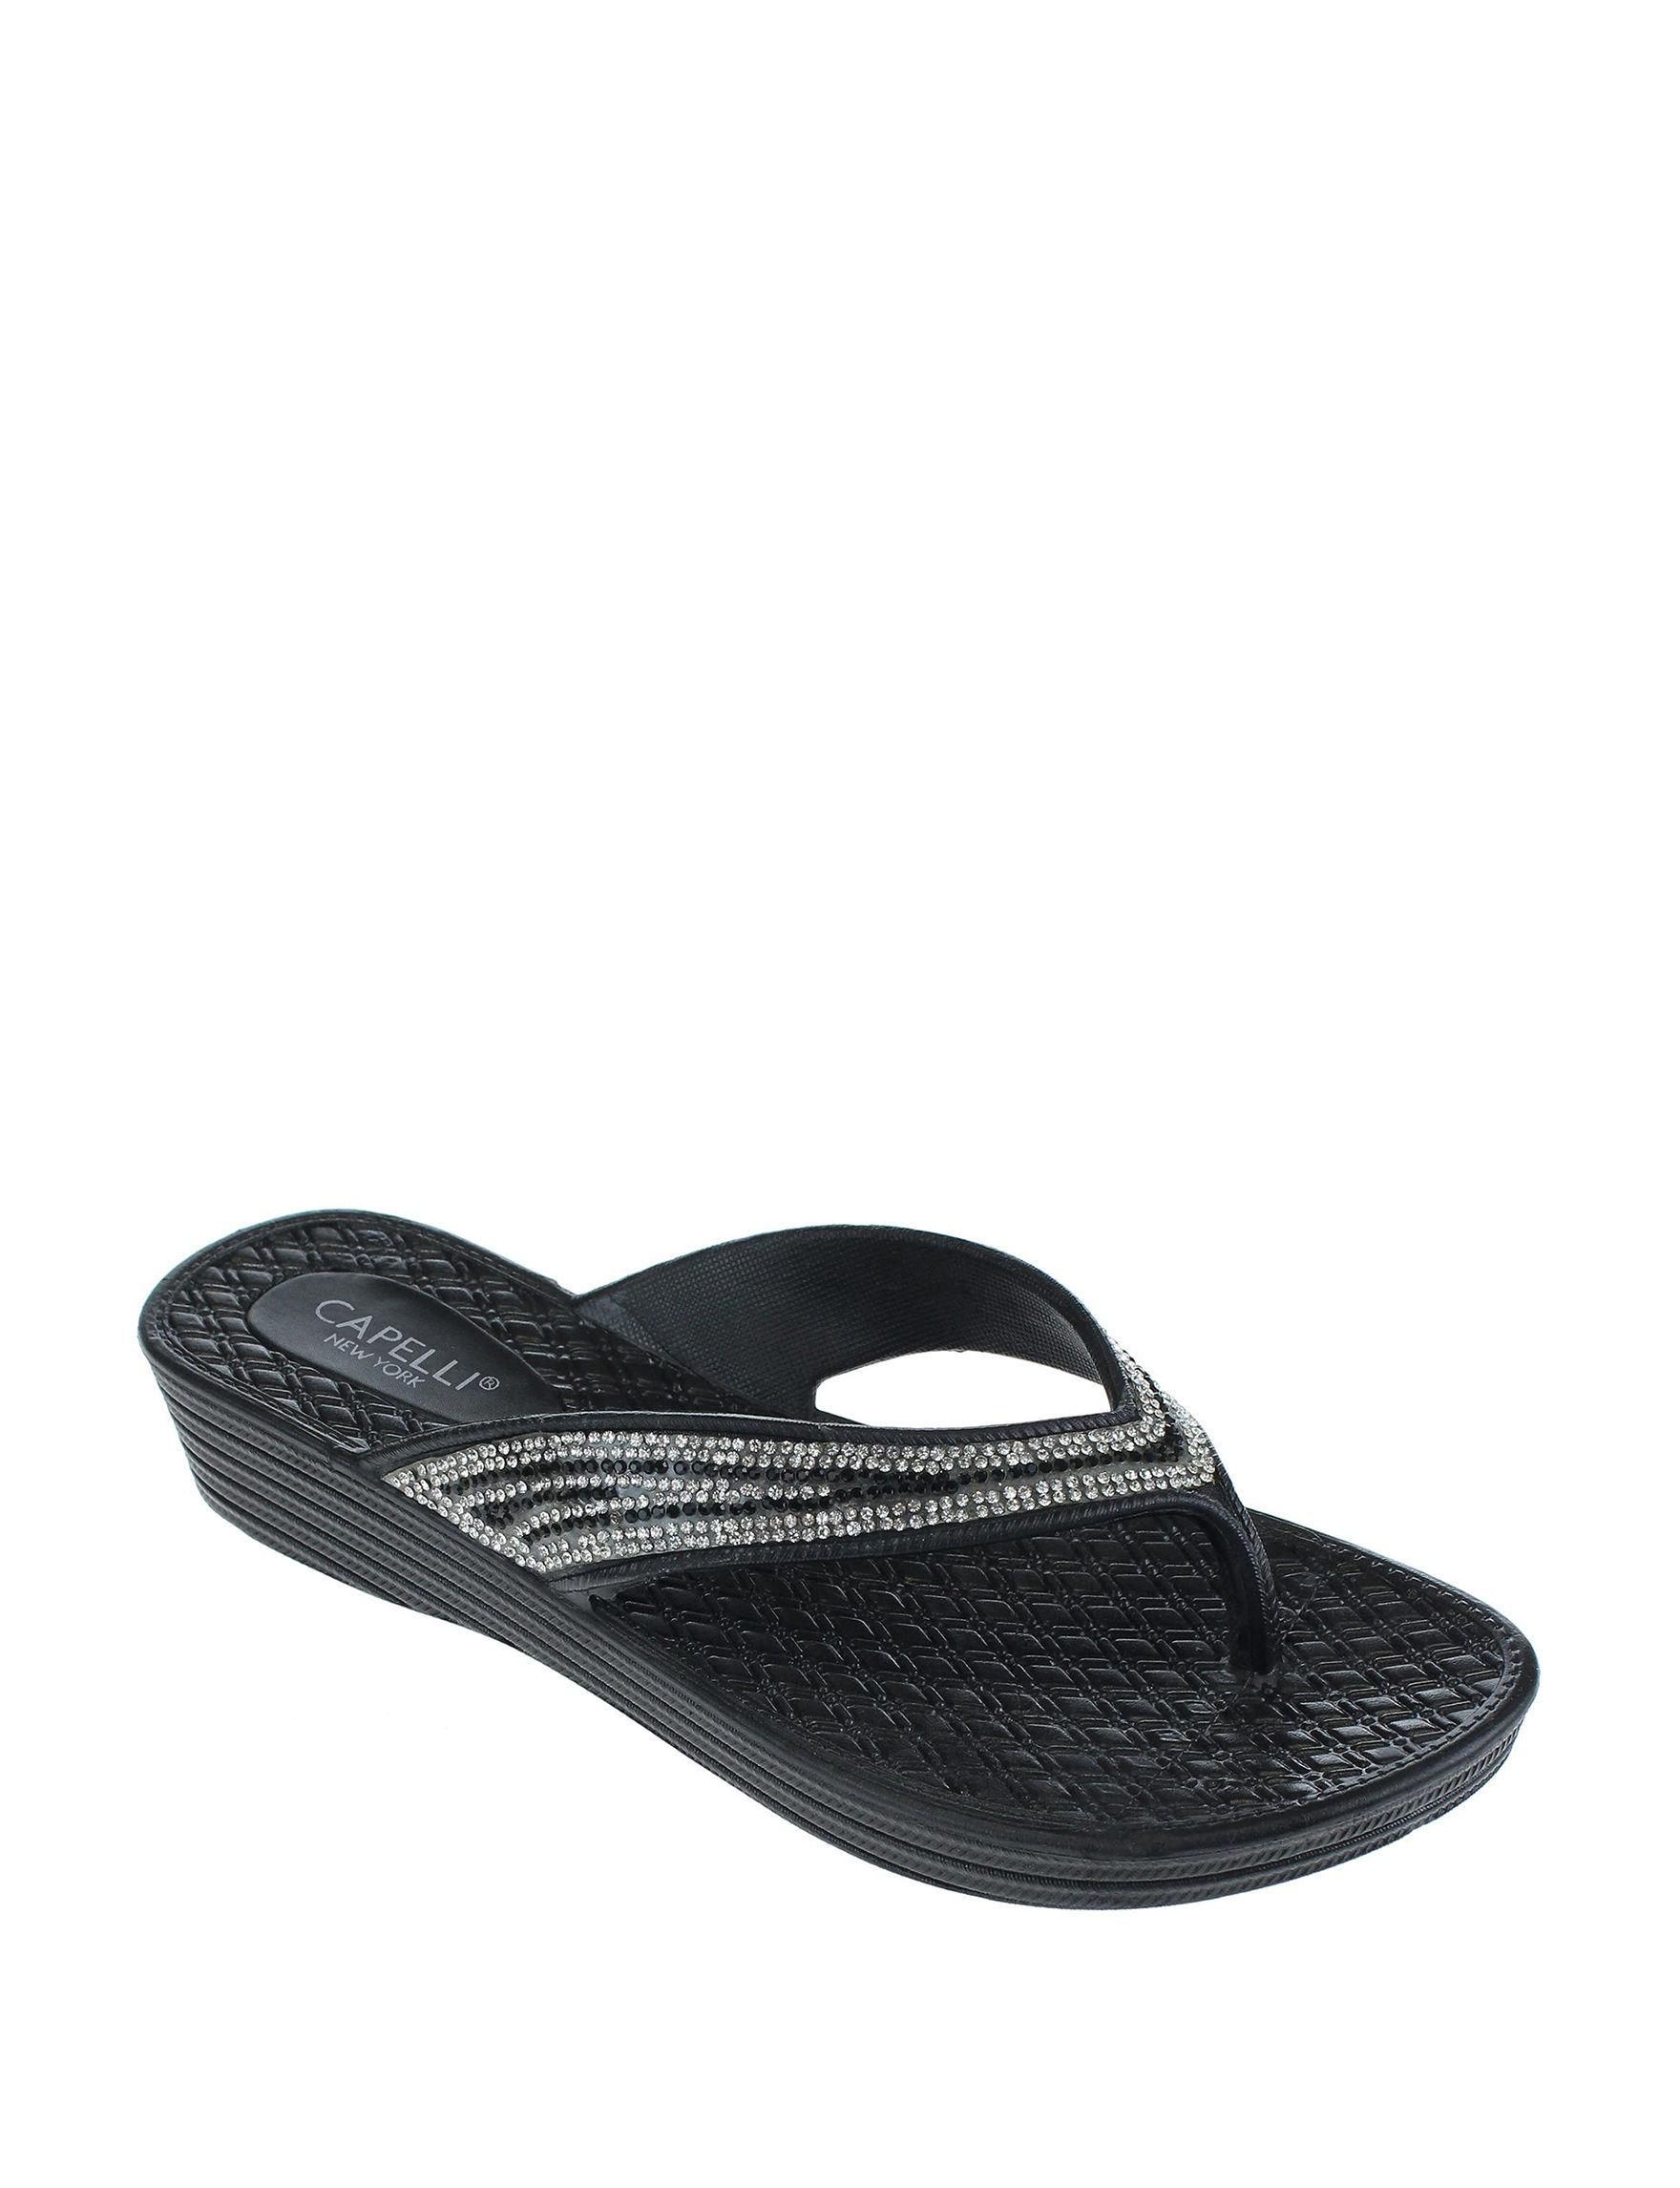 Capelli Black Flip Flops Wedge Sandals